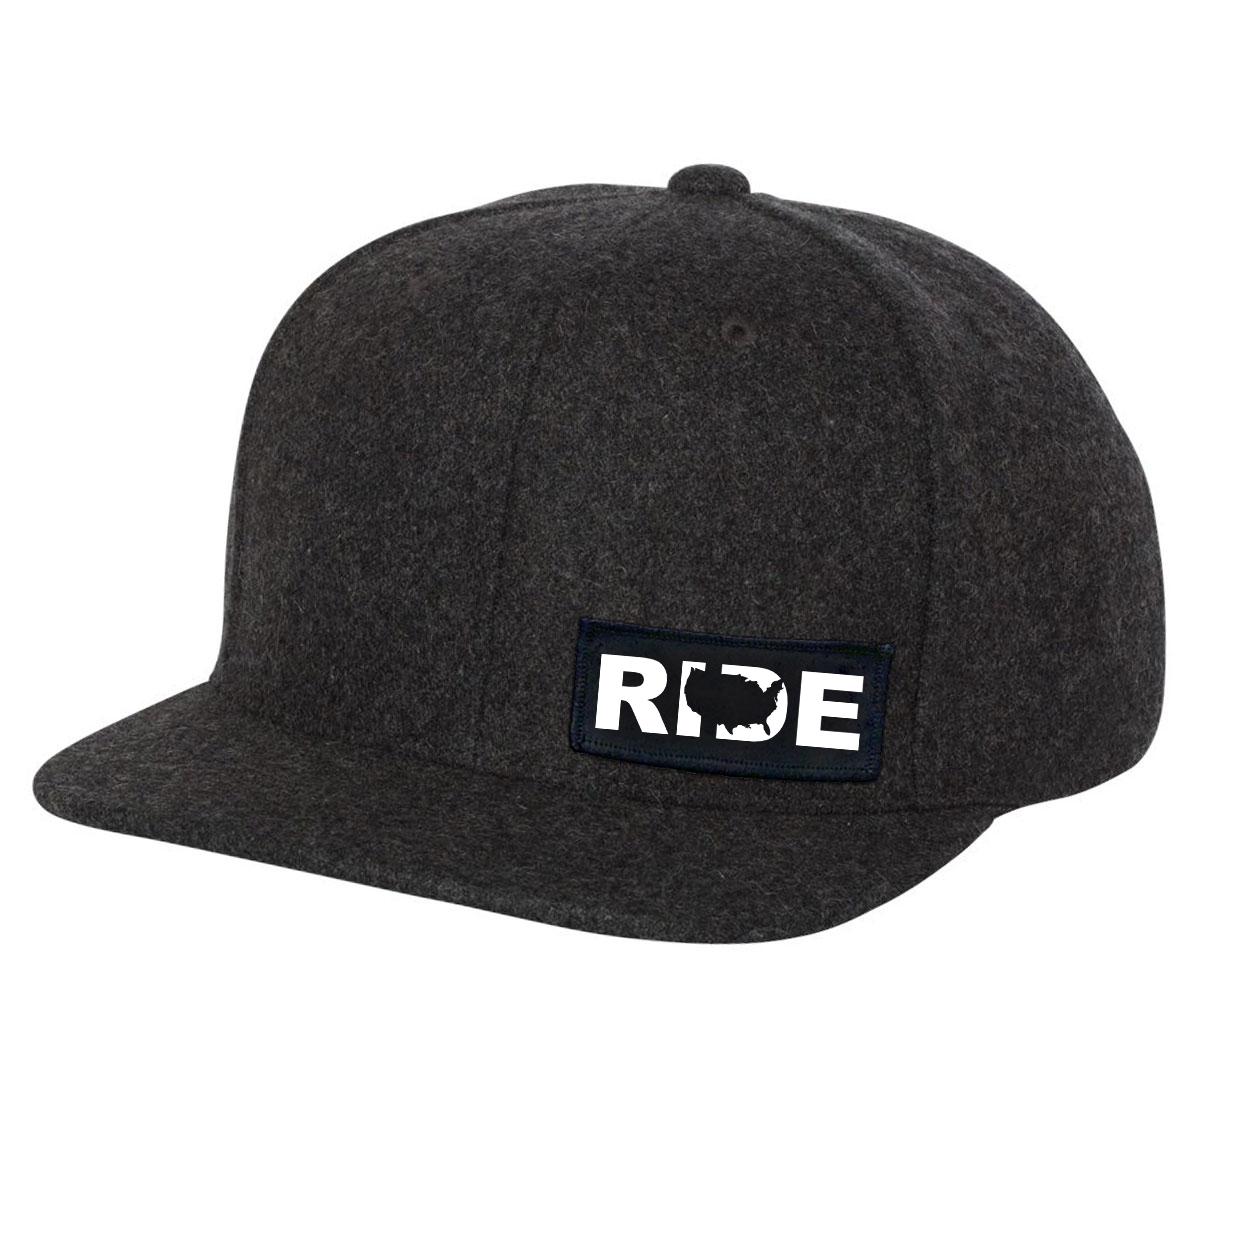 Ride United States Night Out Woven Patch Flat Brim Snapback Hat Dark Heather Gray Wool (White Logo)